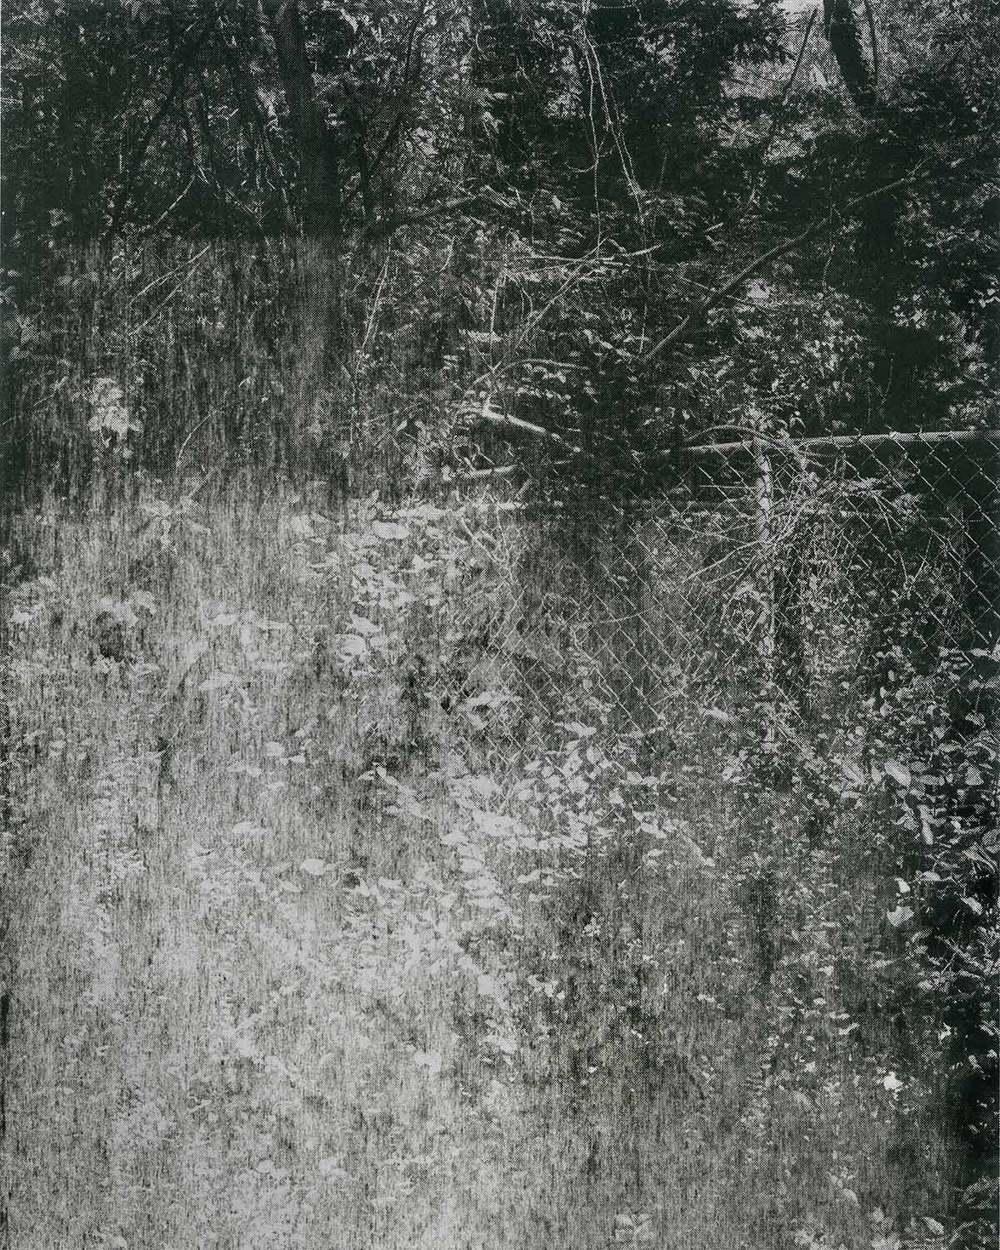 tree-02-web.jpg